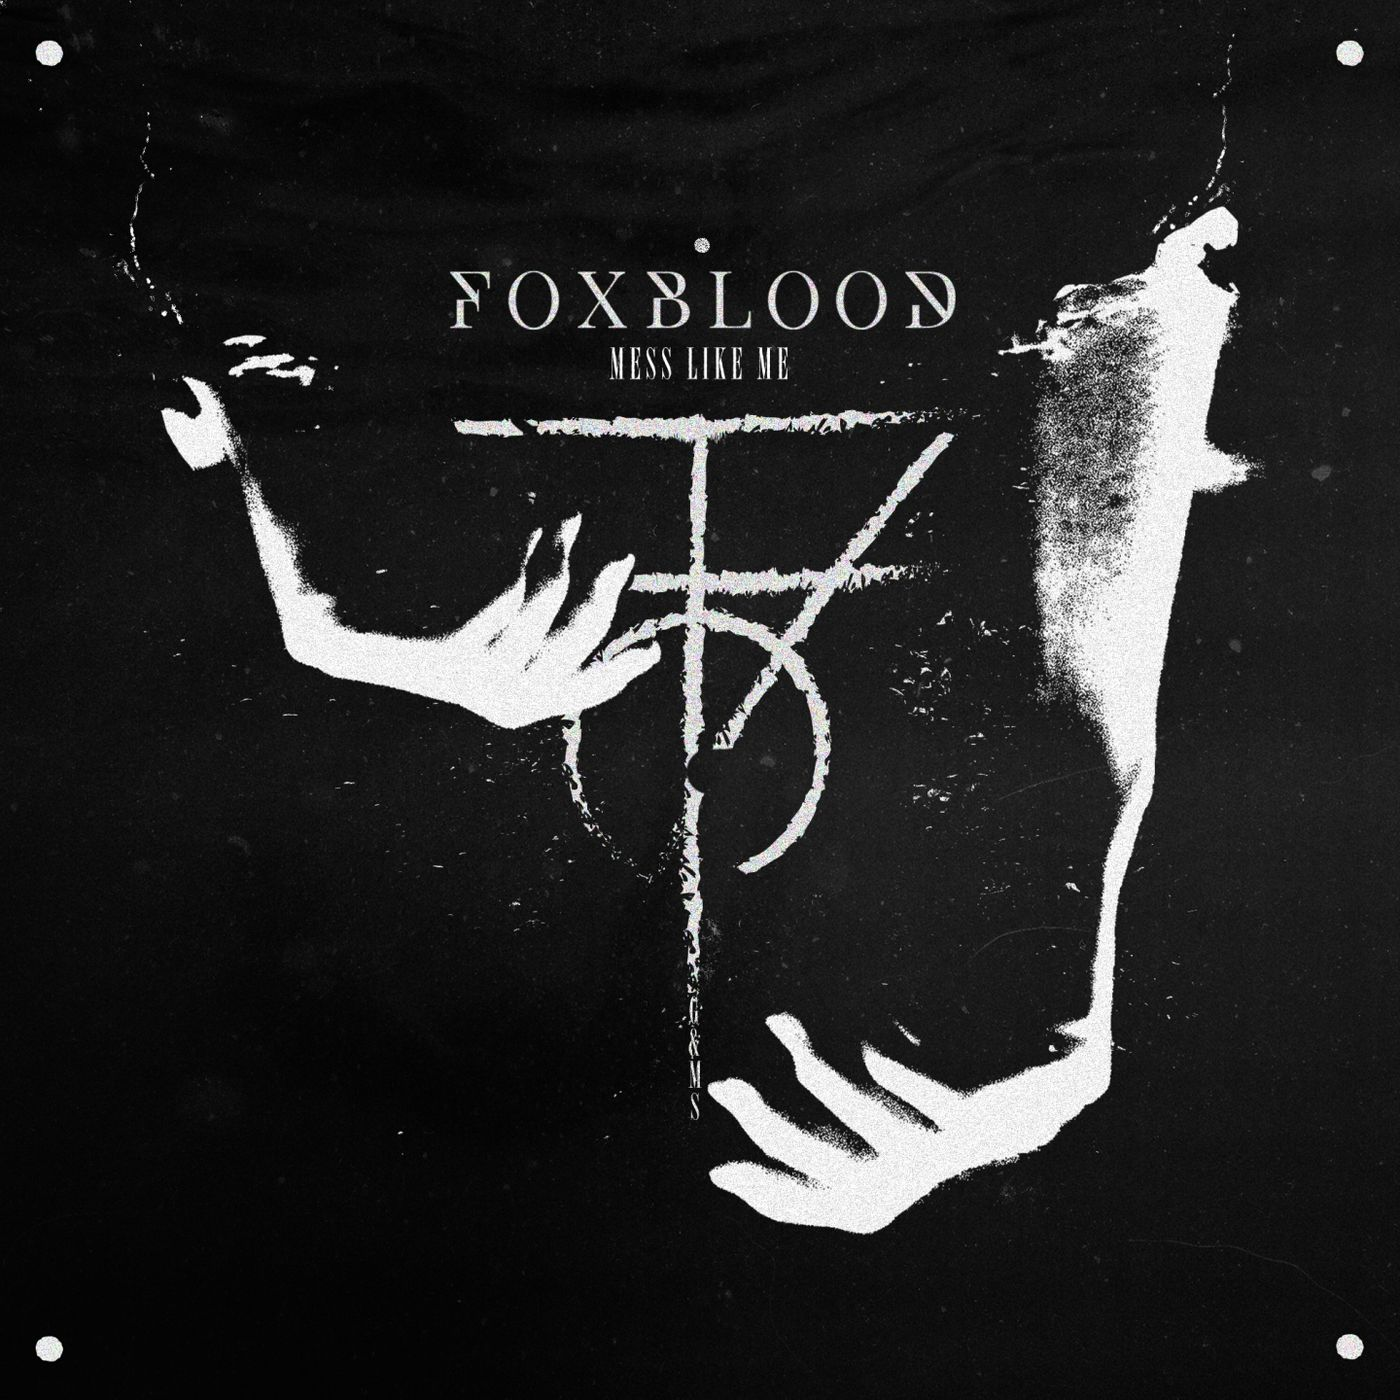 Foxblood - Mess Like Me [single] (2019)